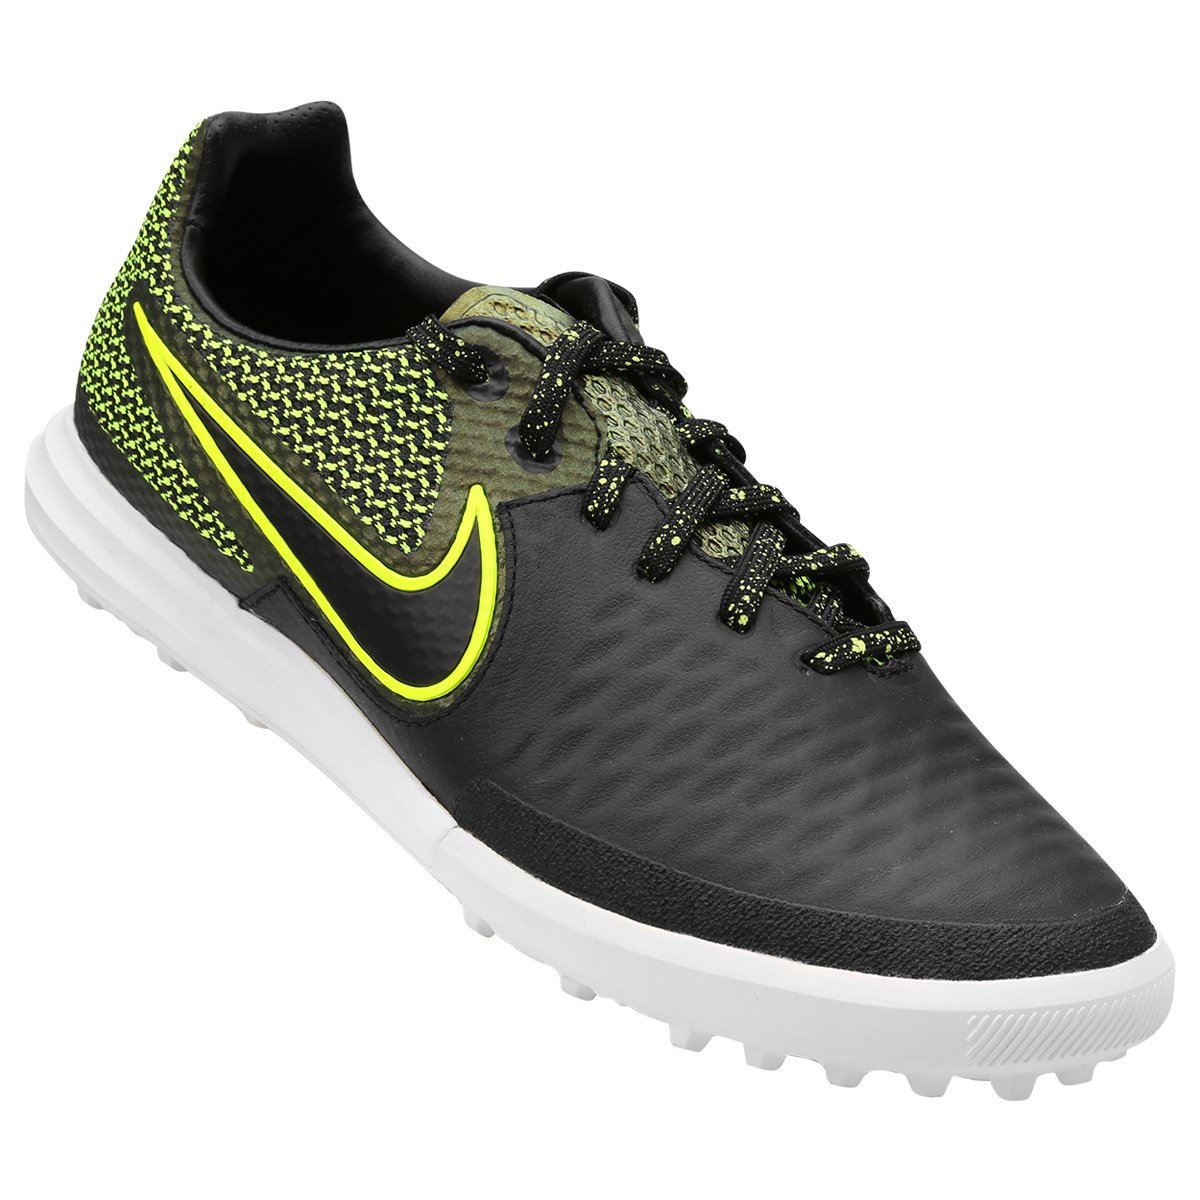 Chuteira Nike Magista X Finale TF Society - Compre Agora  186aa1dd82773